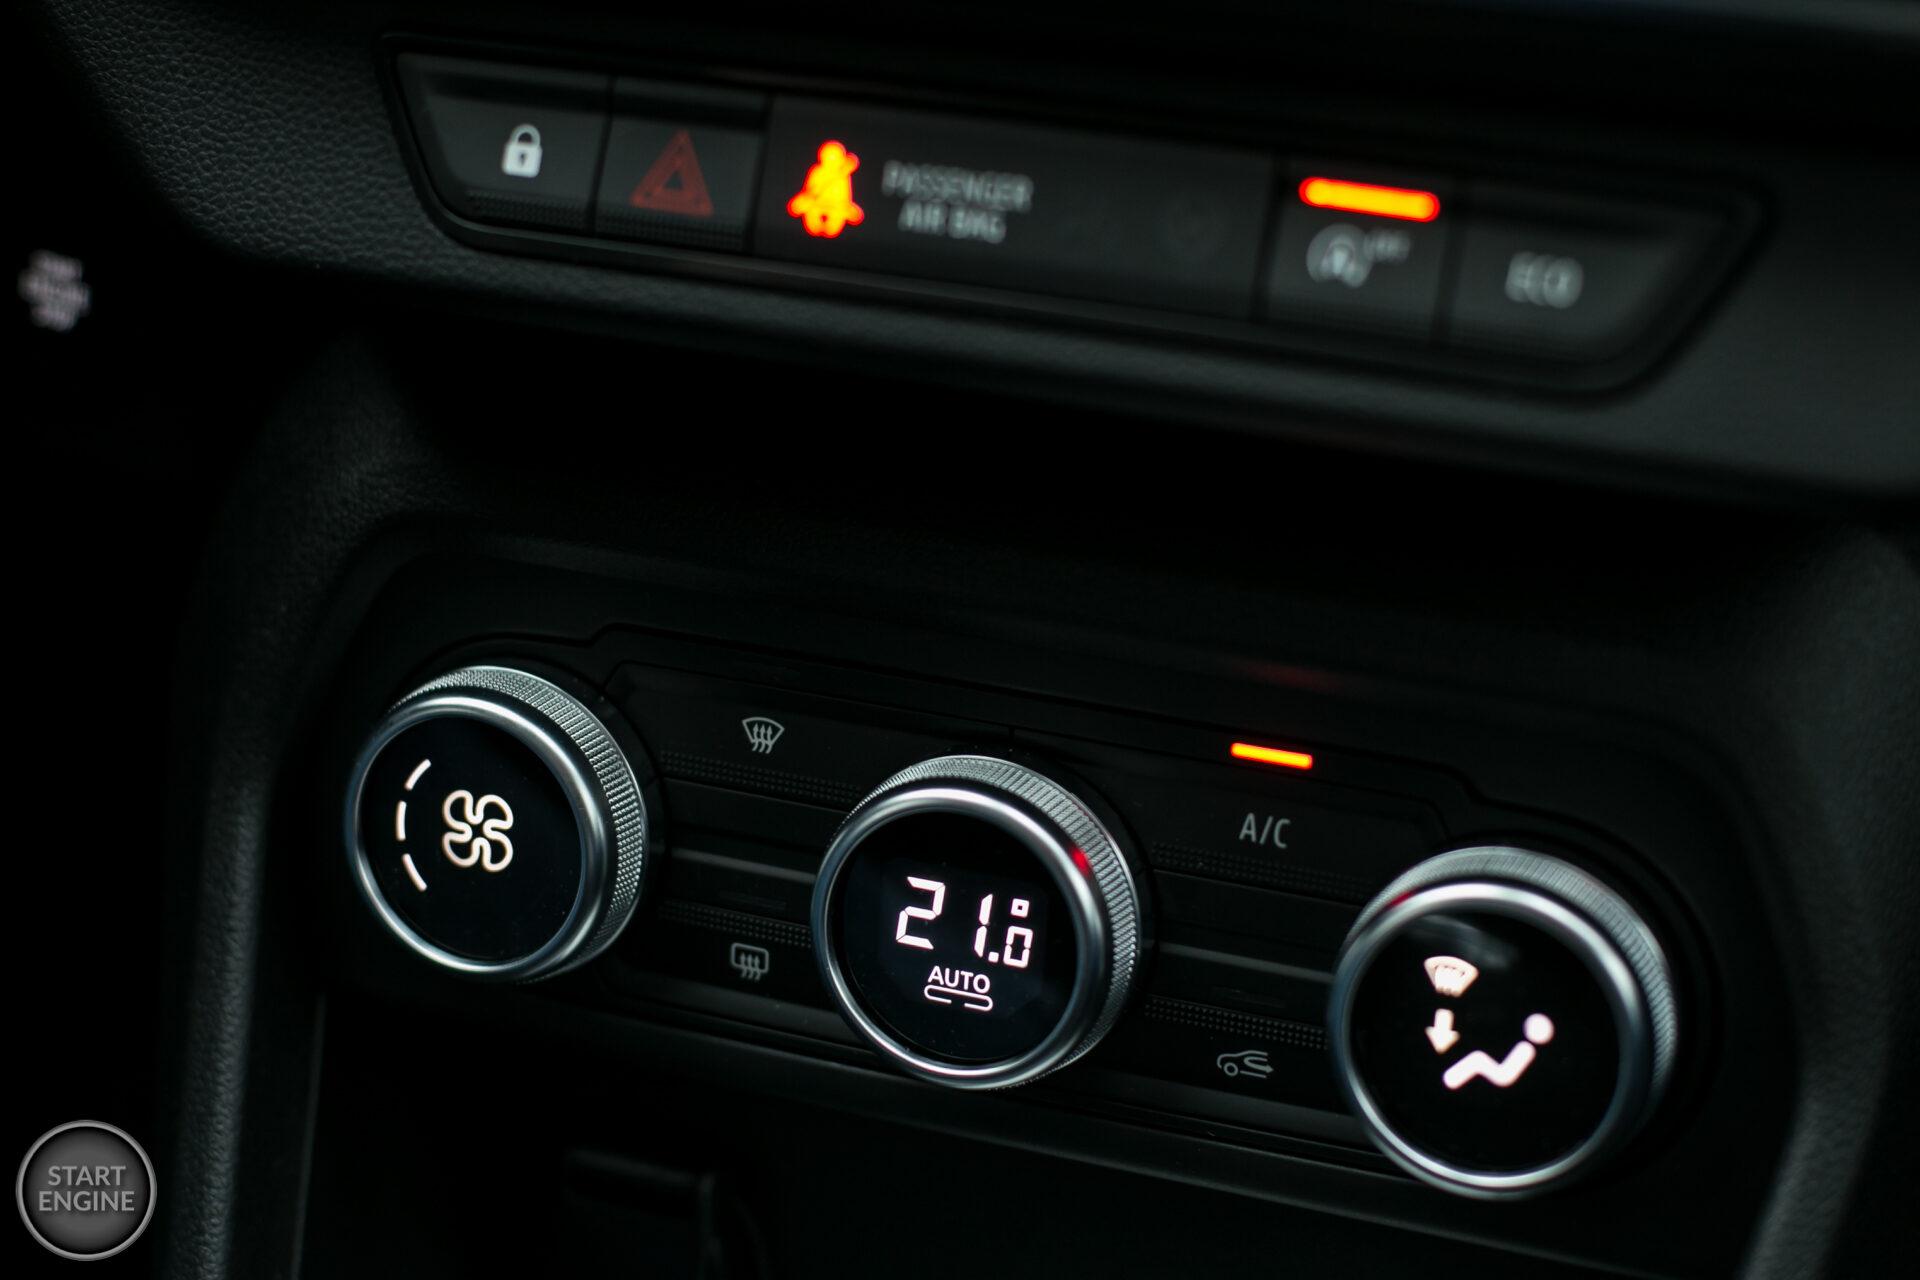 Dacia Sandero Comfort 1.0 TCe 100 KM LPG